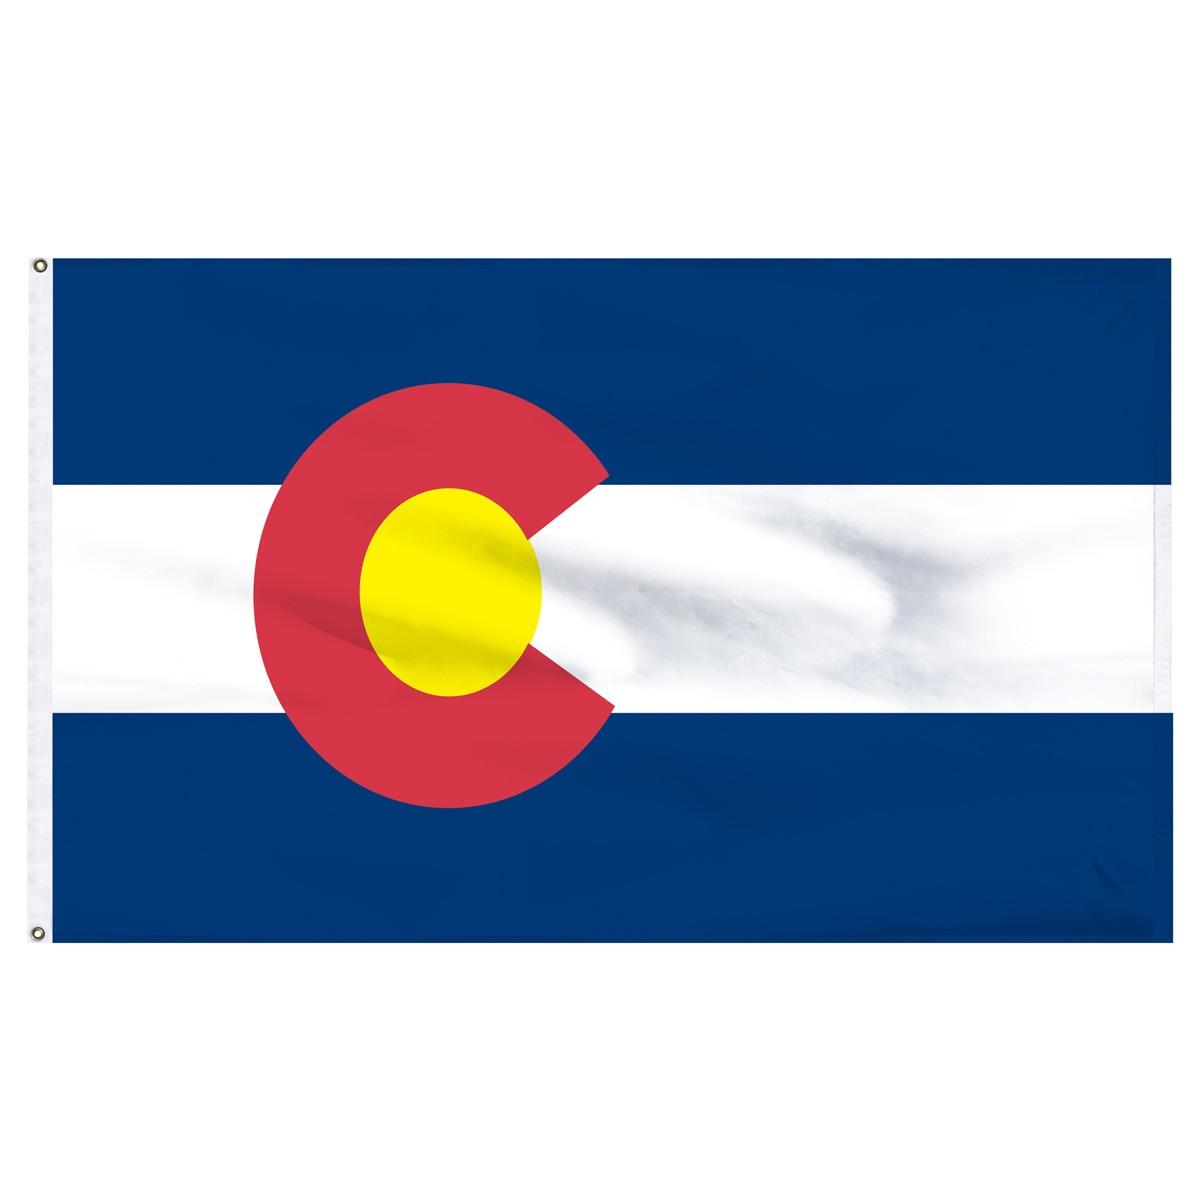 Colorado 3x5ft Nylon Flag with Pole Hem Only.